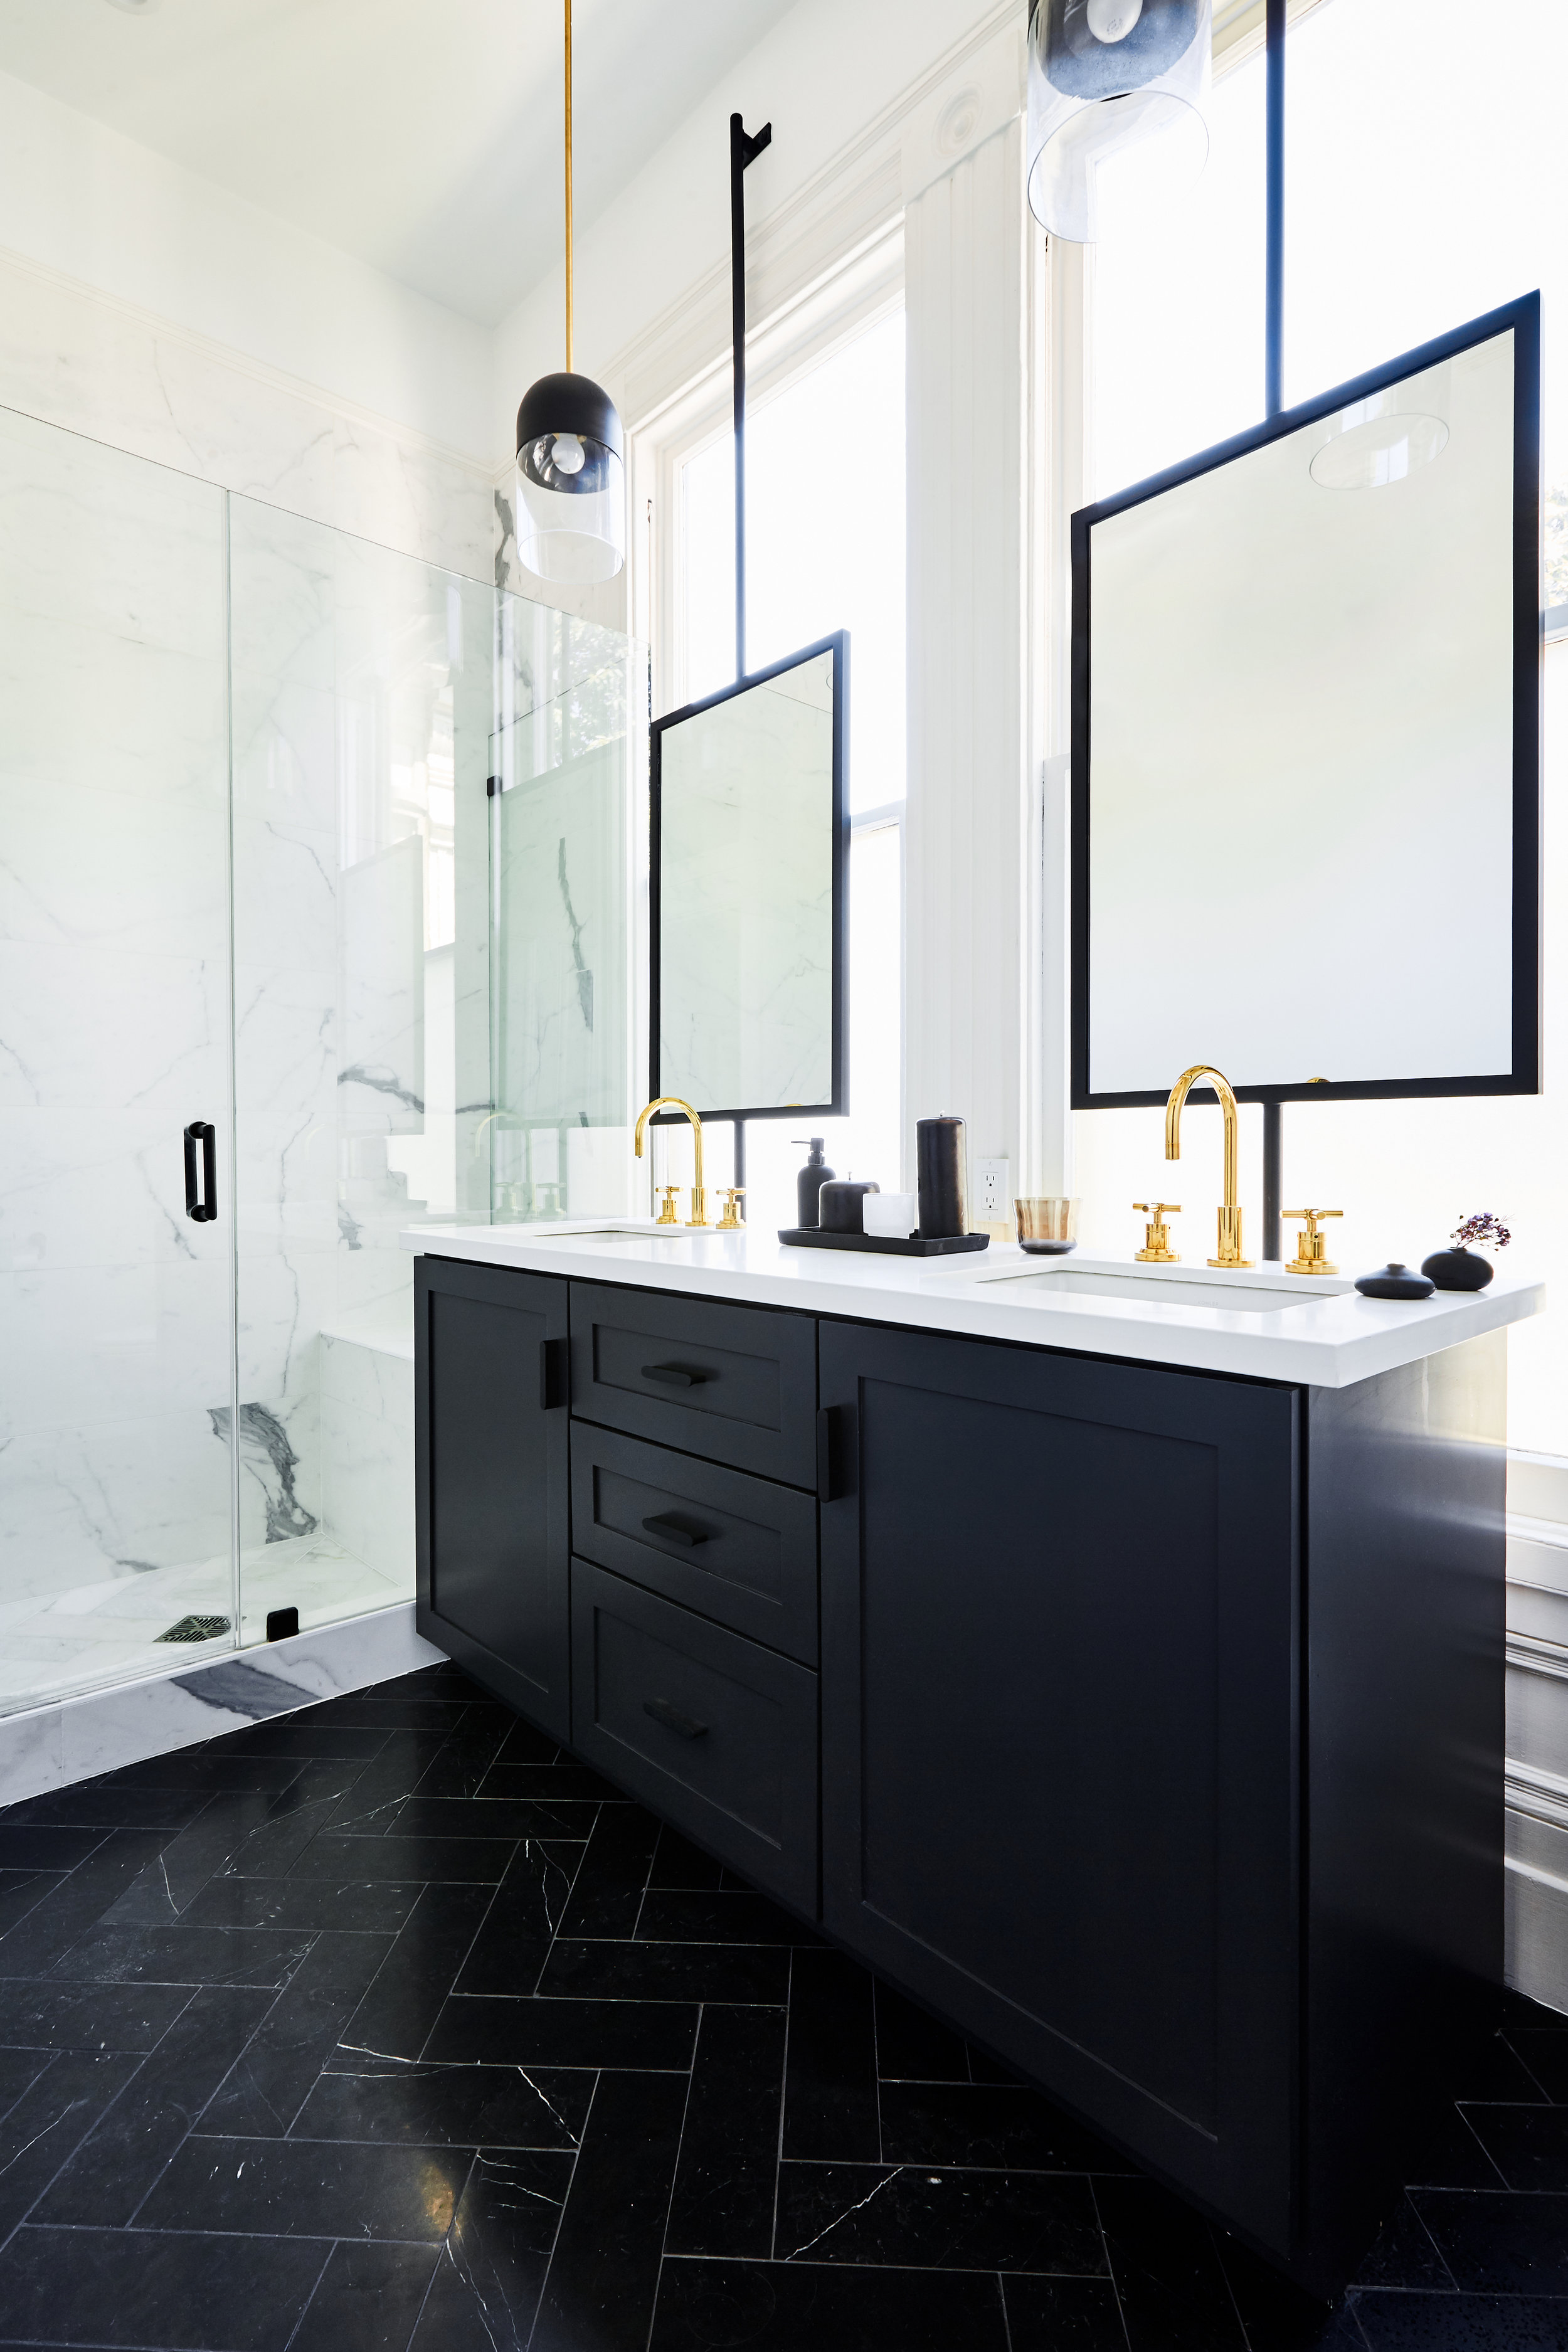 Noz Design - Duboce Flat - 25885.jpg